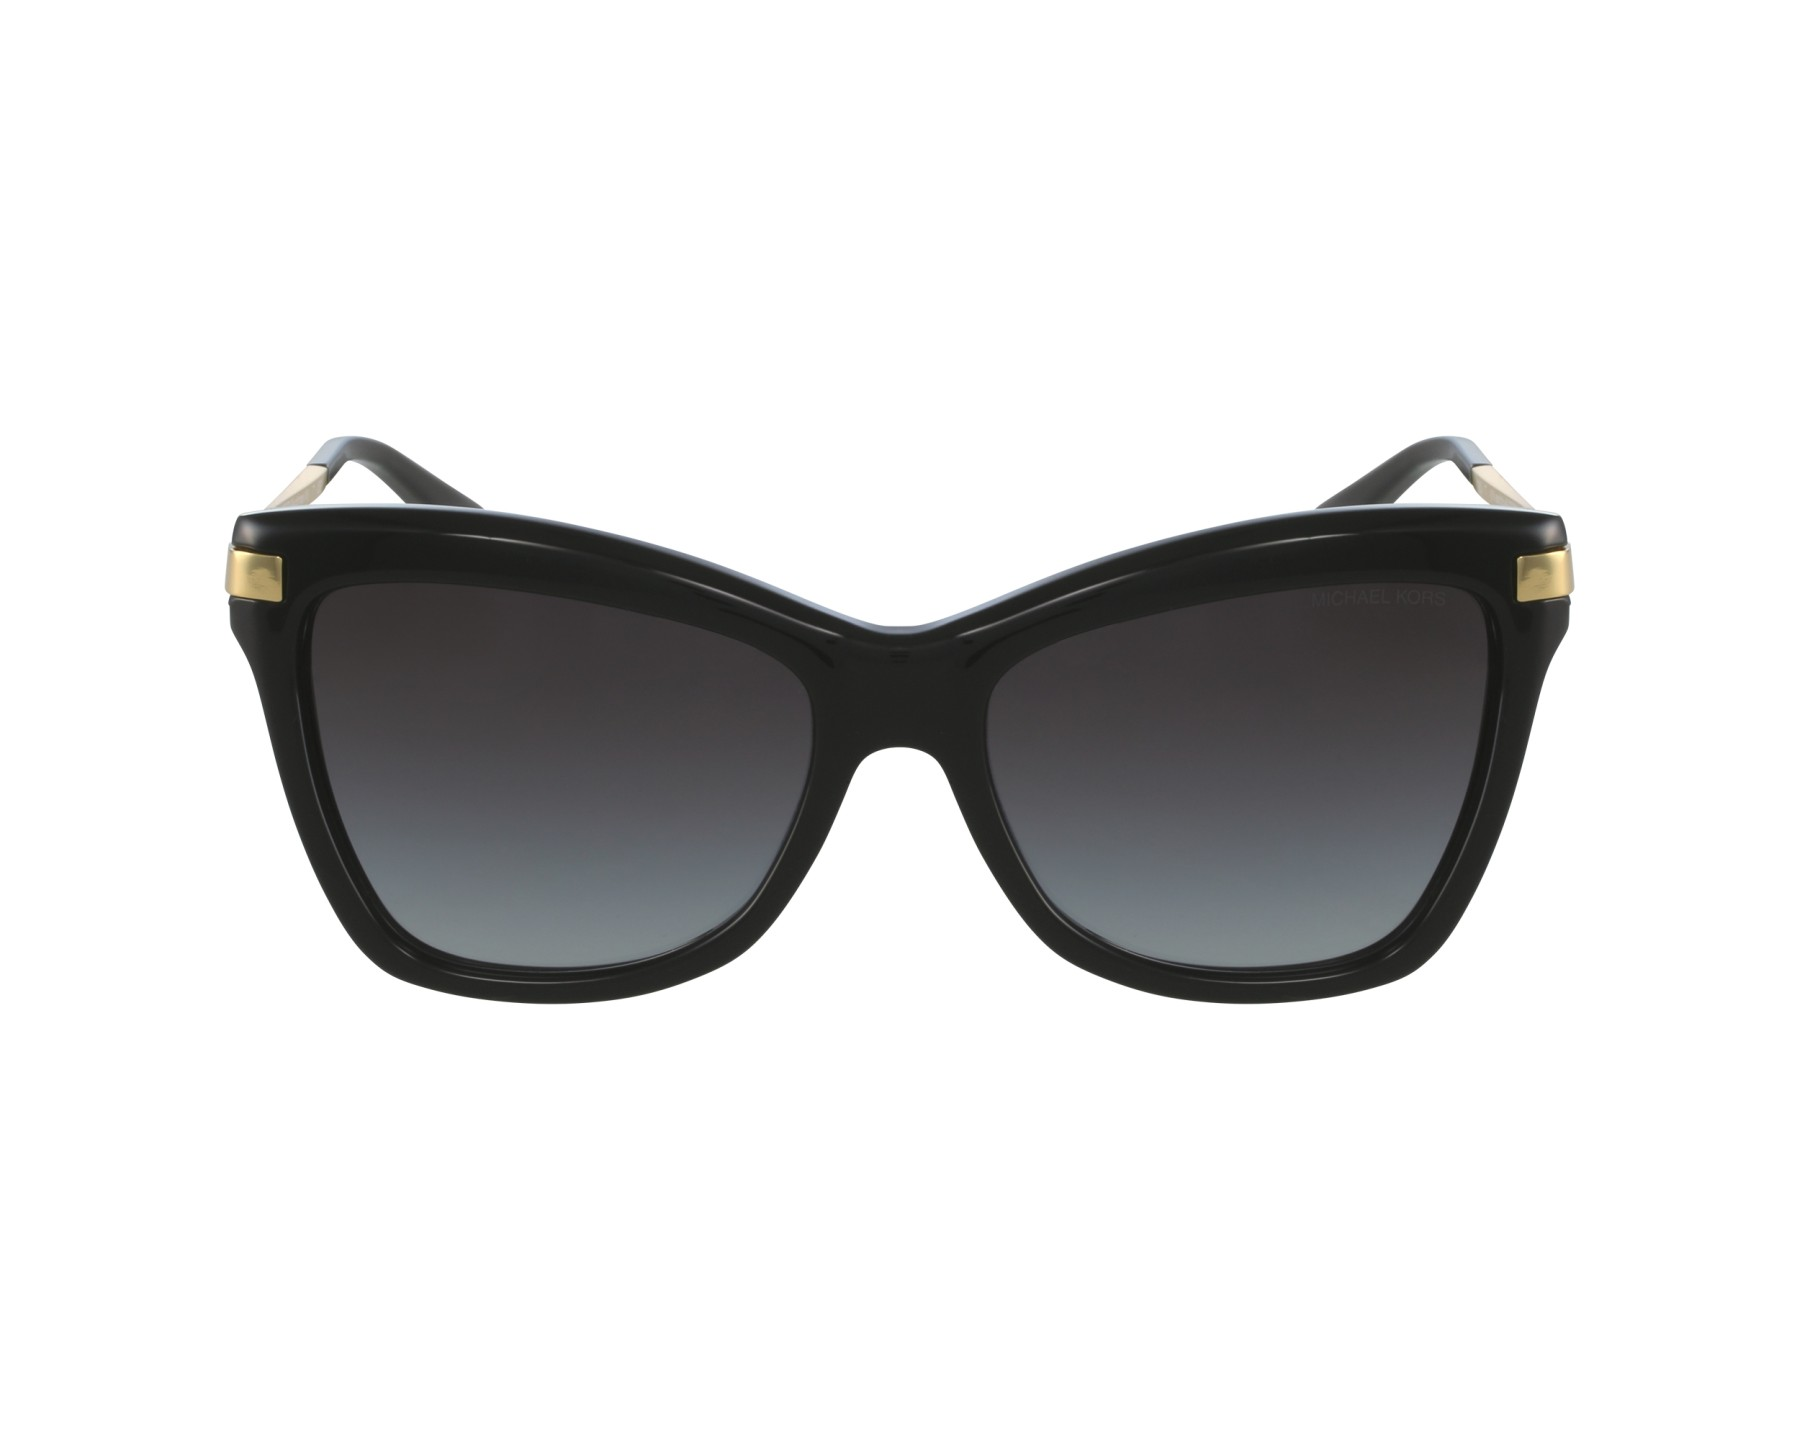 achat lunettes de soleil michael kors mk 2027 3171 11 visionet. Black Bedroom Furniture Sets. Home Design Ideas